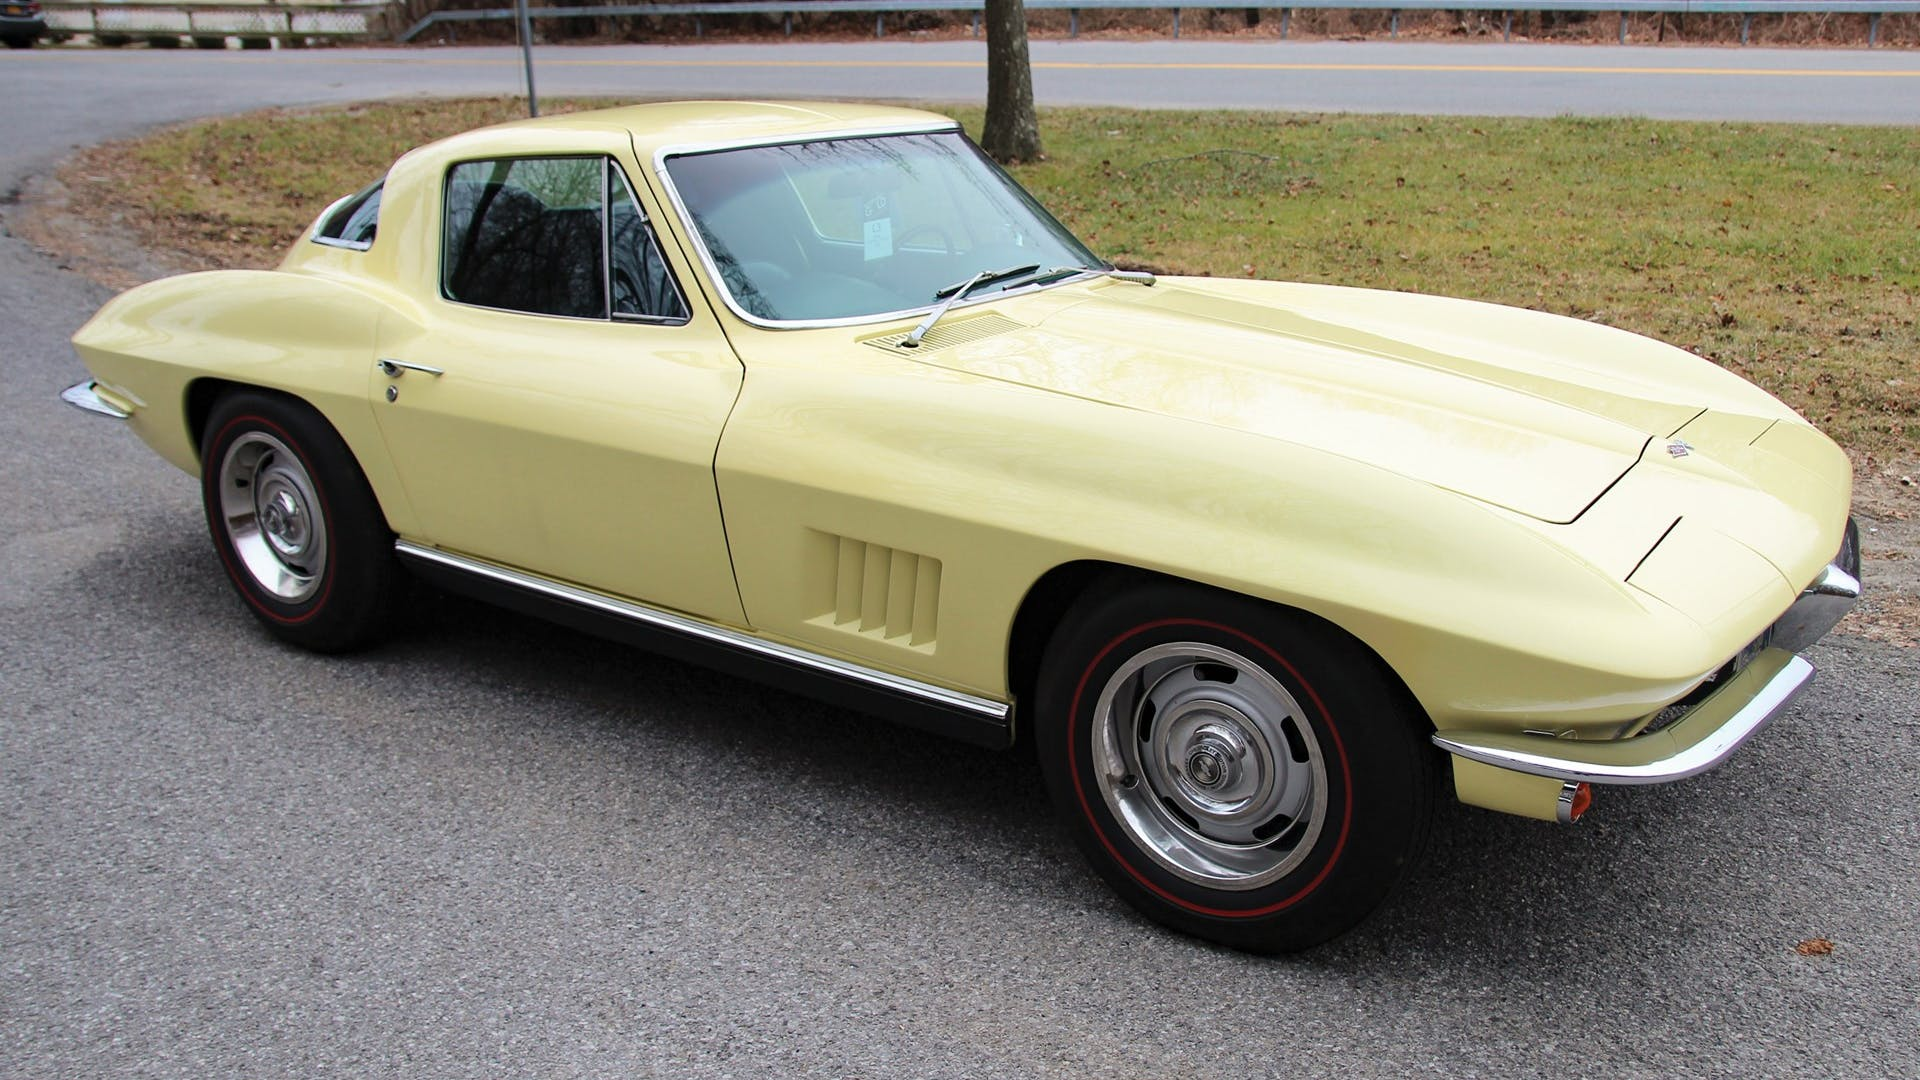 1967 Chevrolet Corvette Sting Ray Coupe